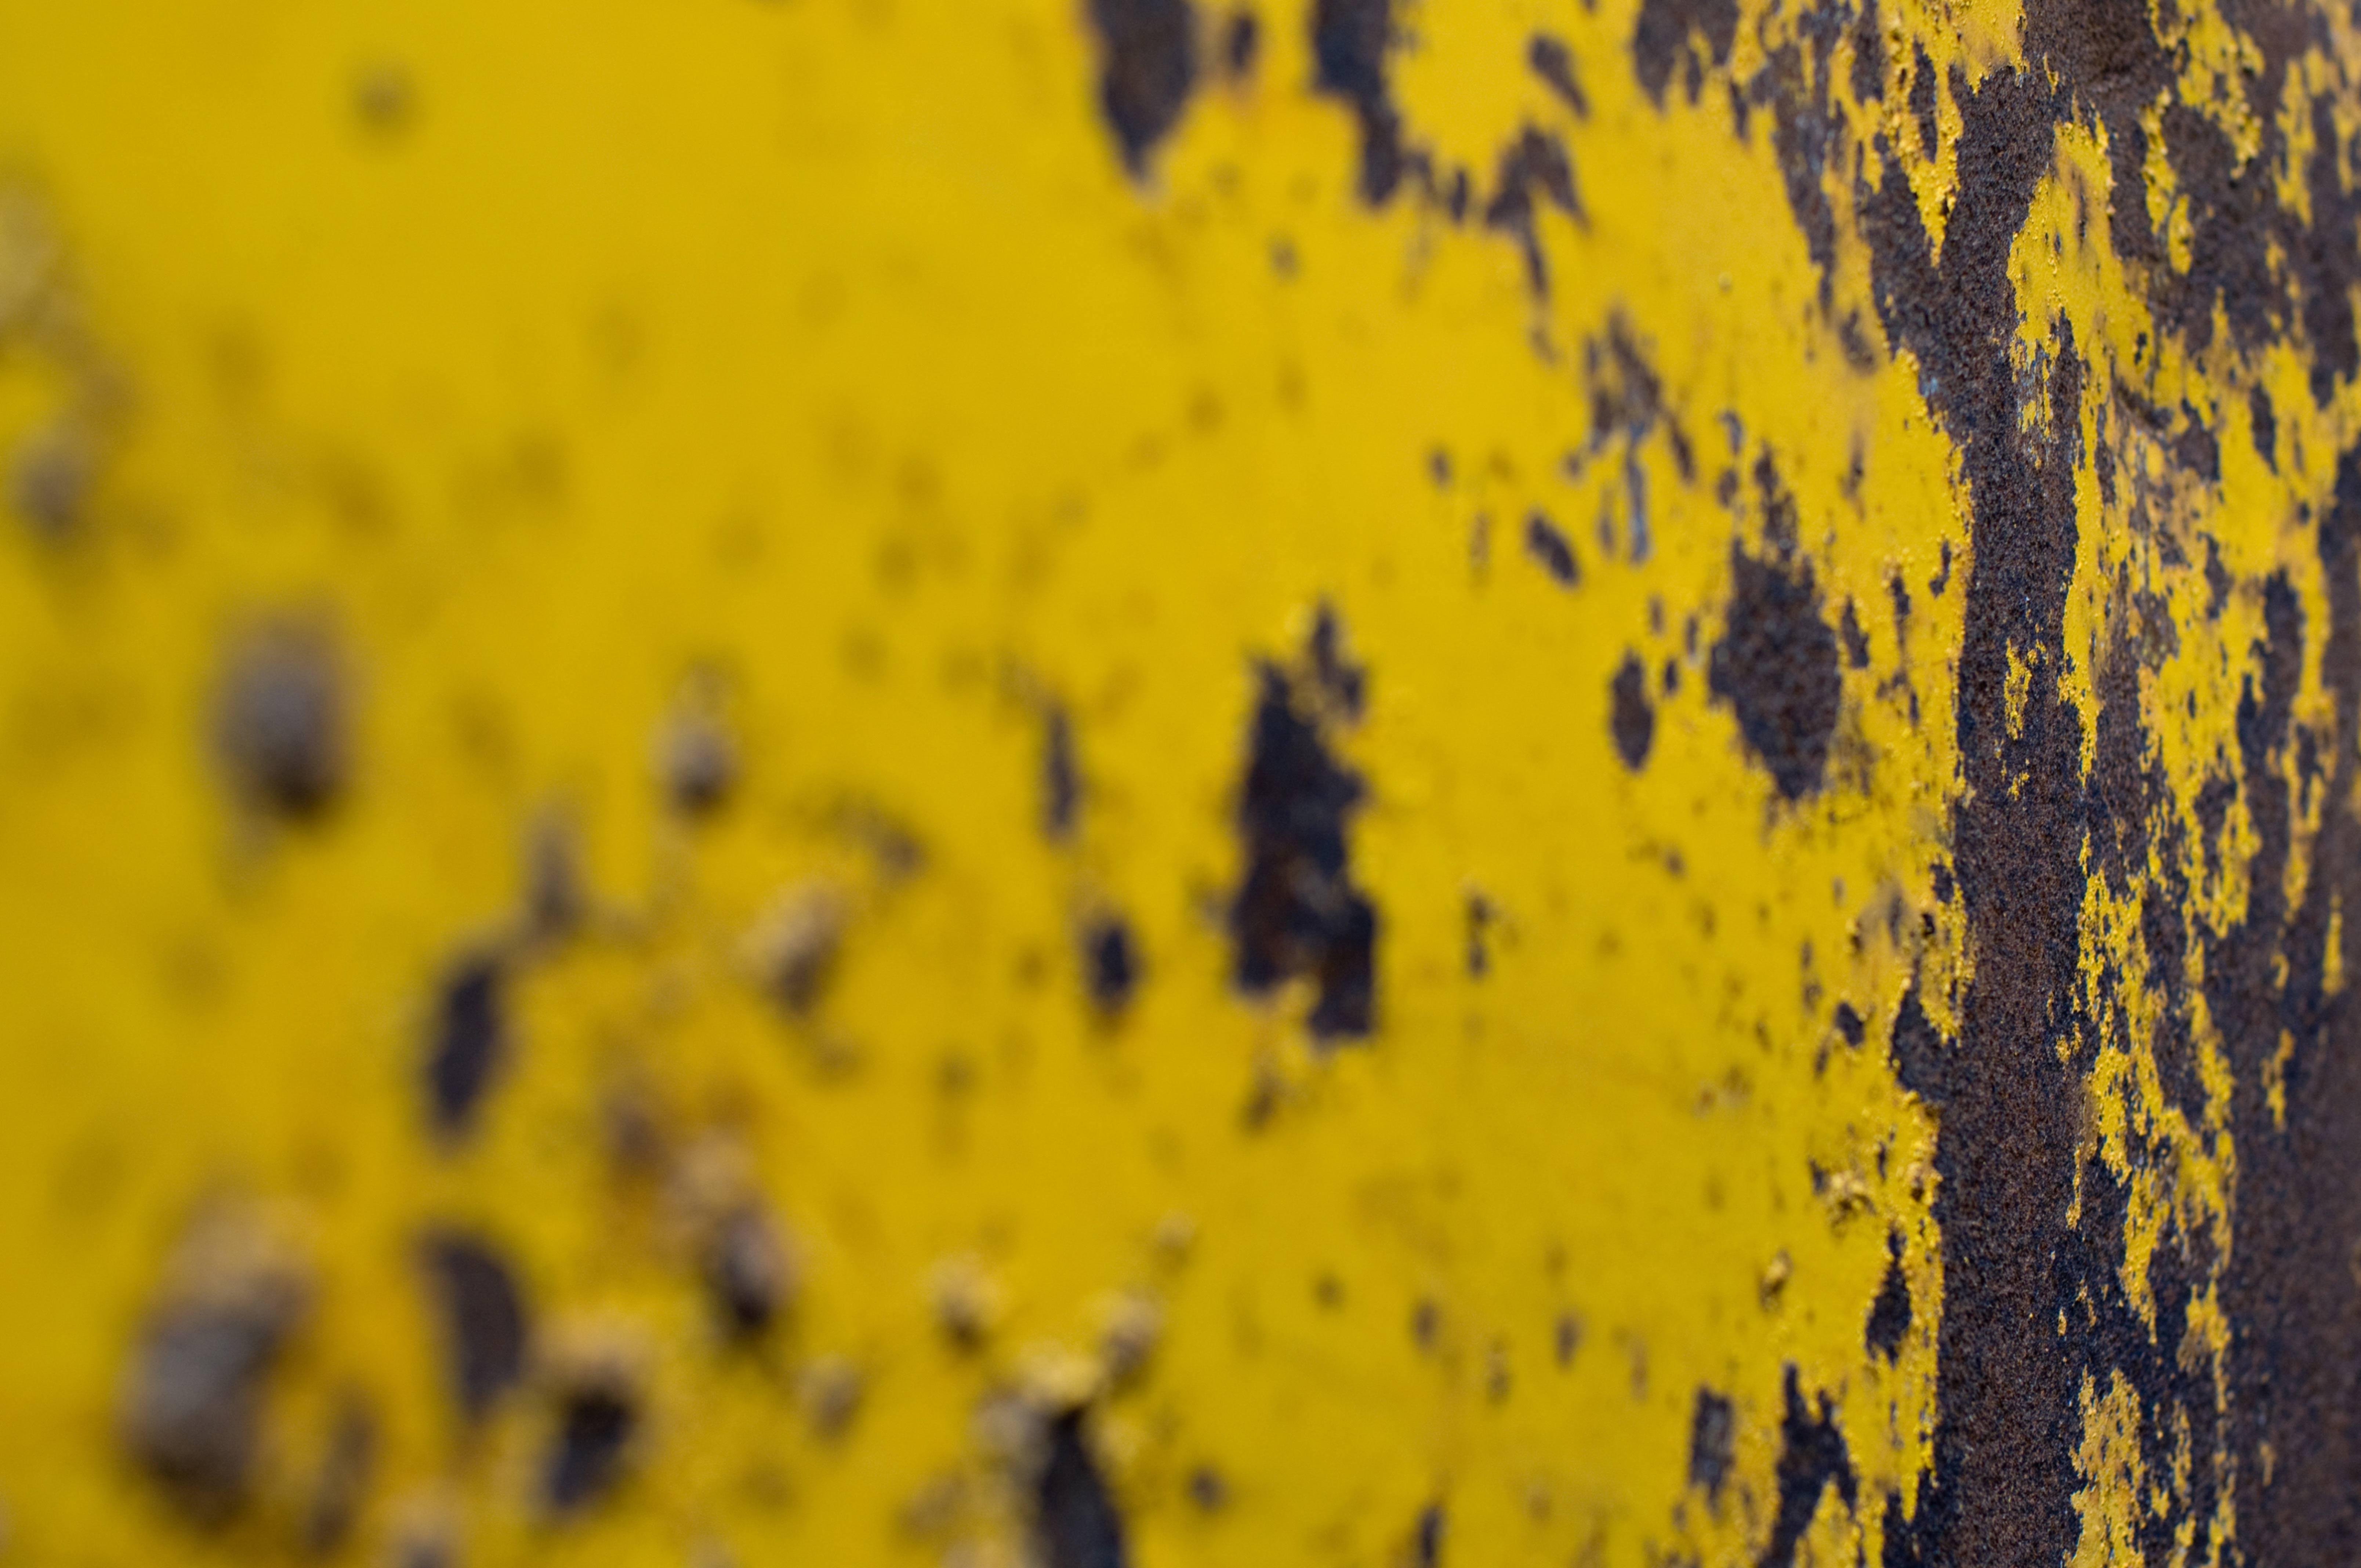 Yellow rusty metal texture photo